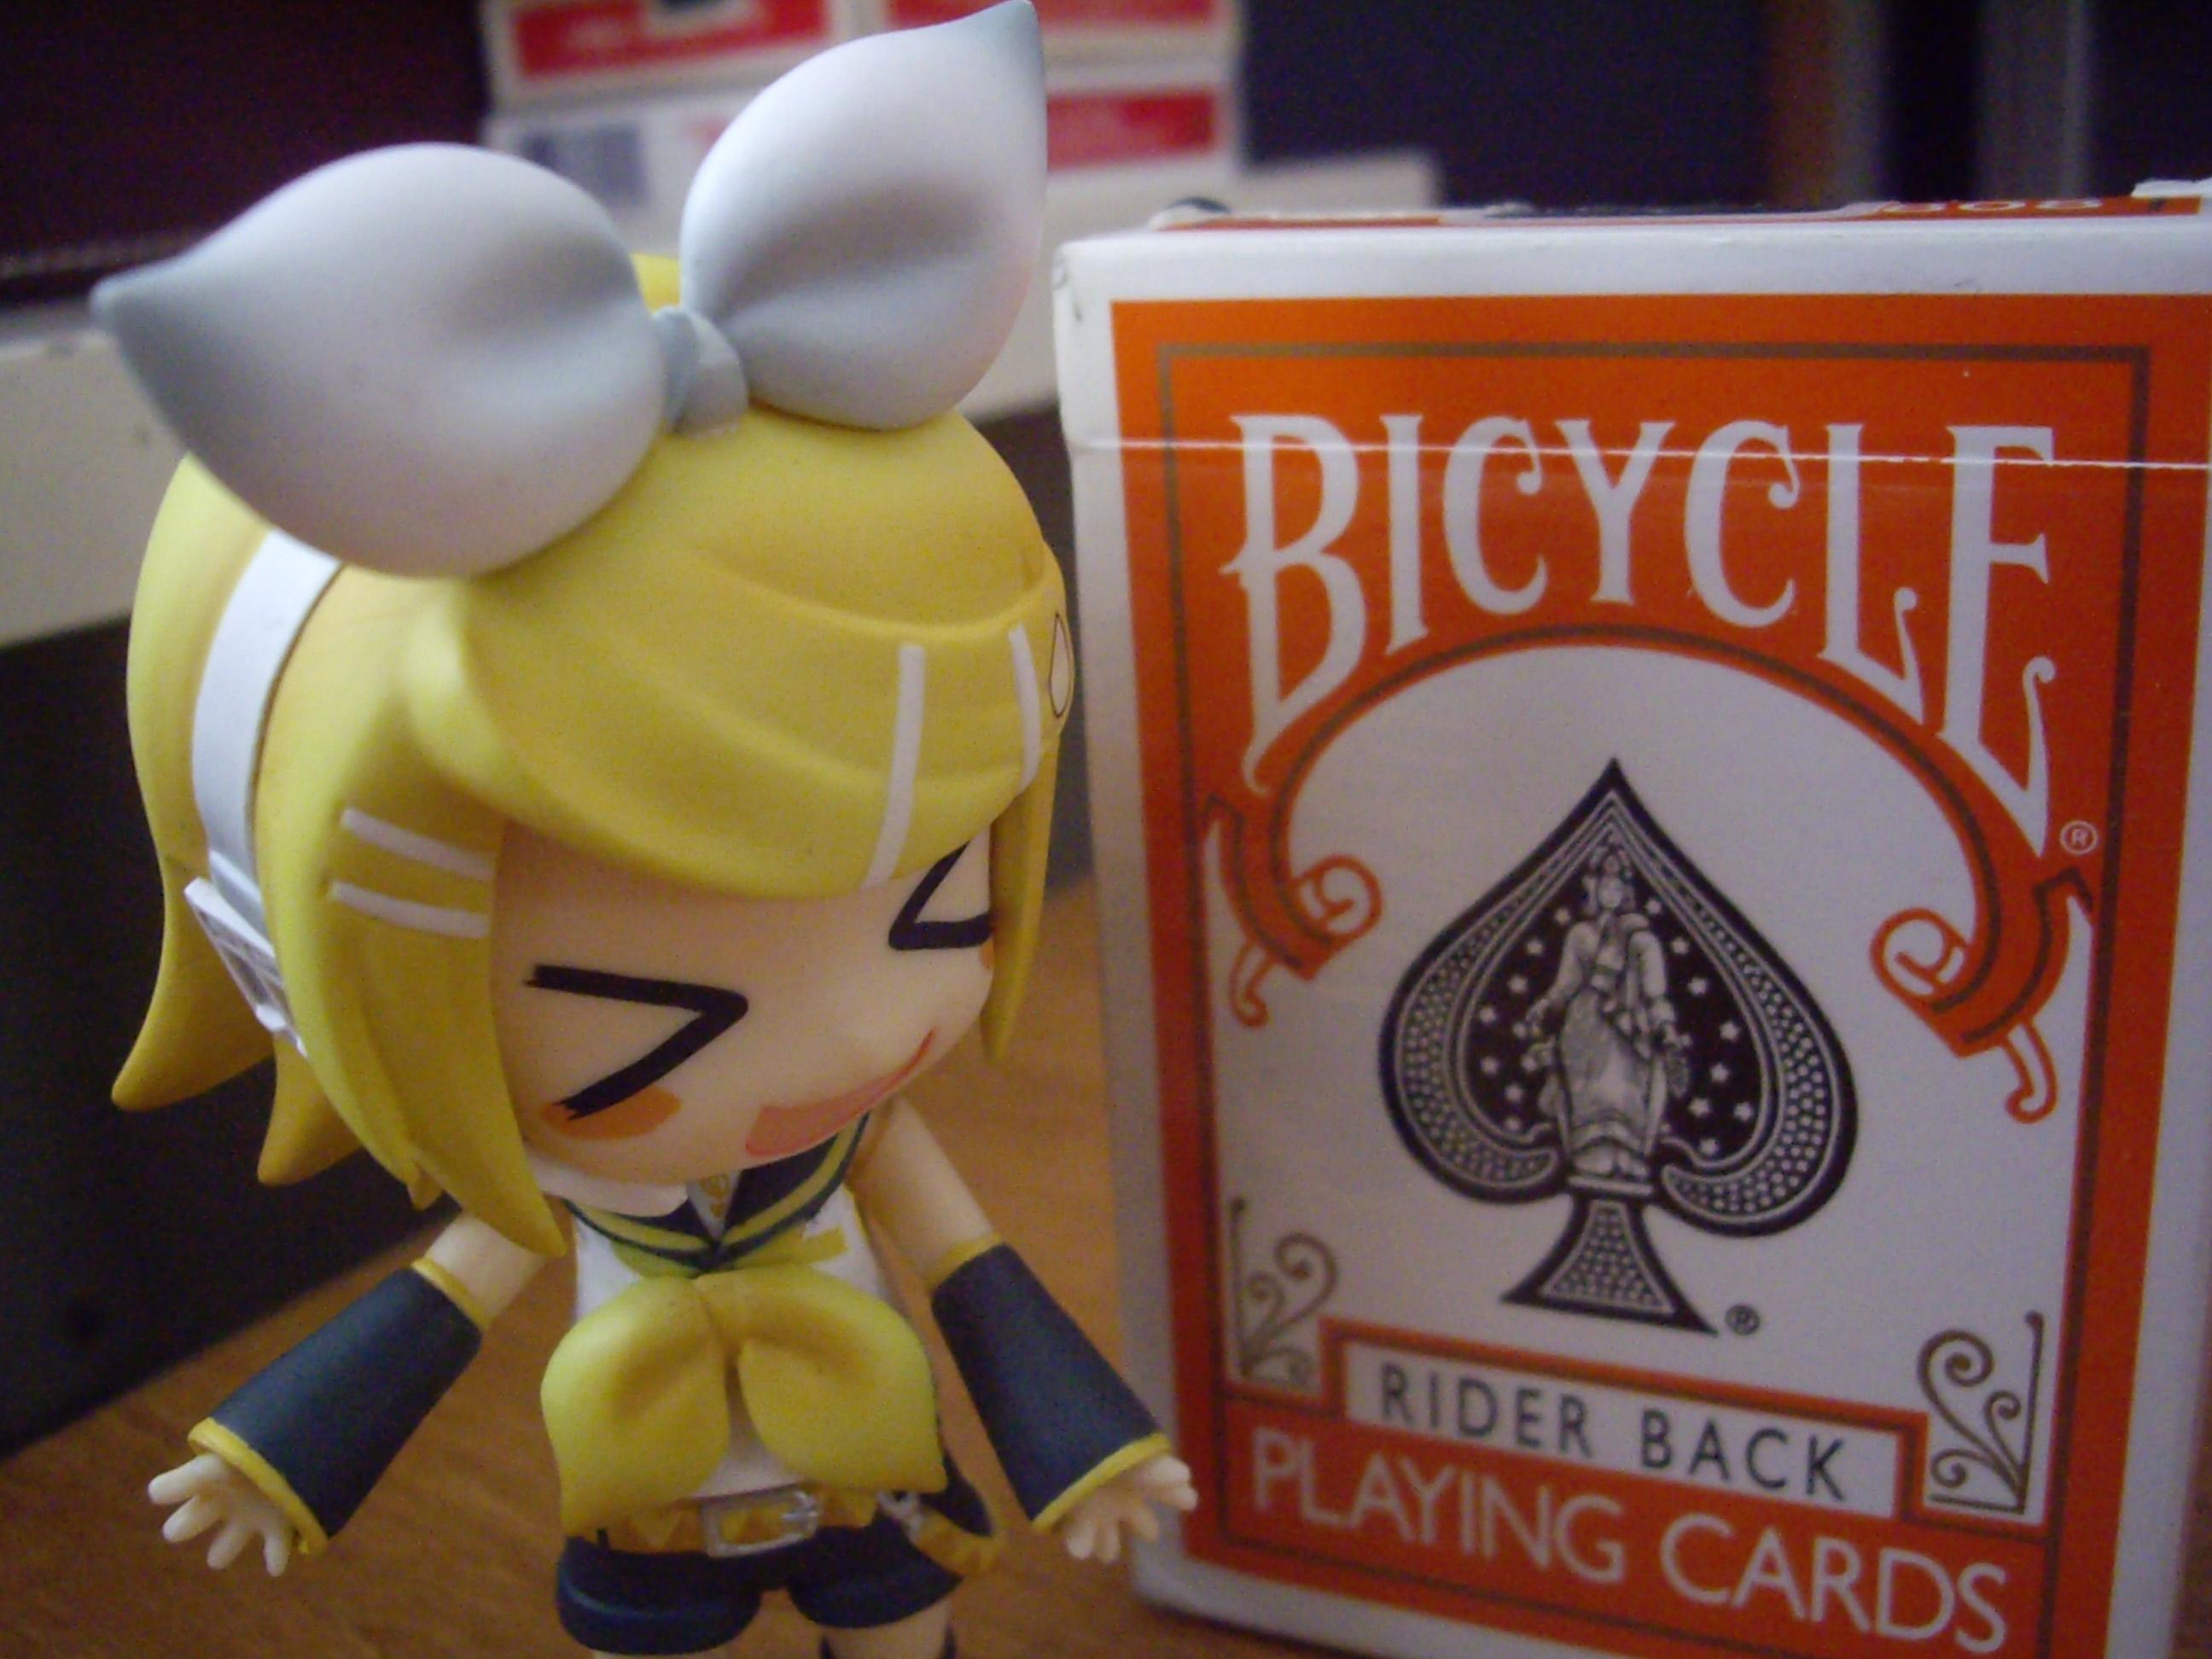 Bicycle Orange : >__<